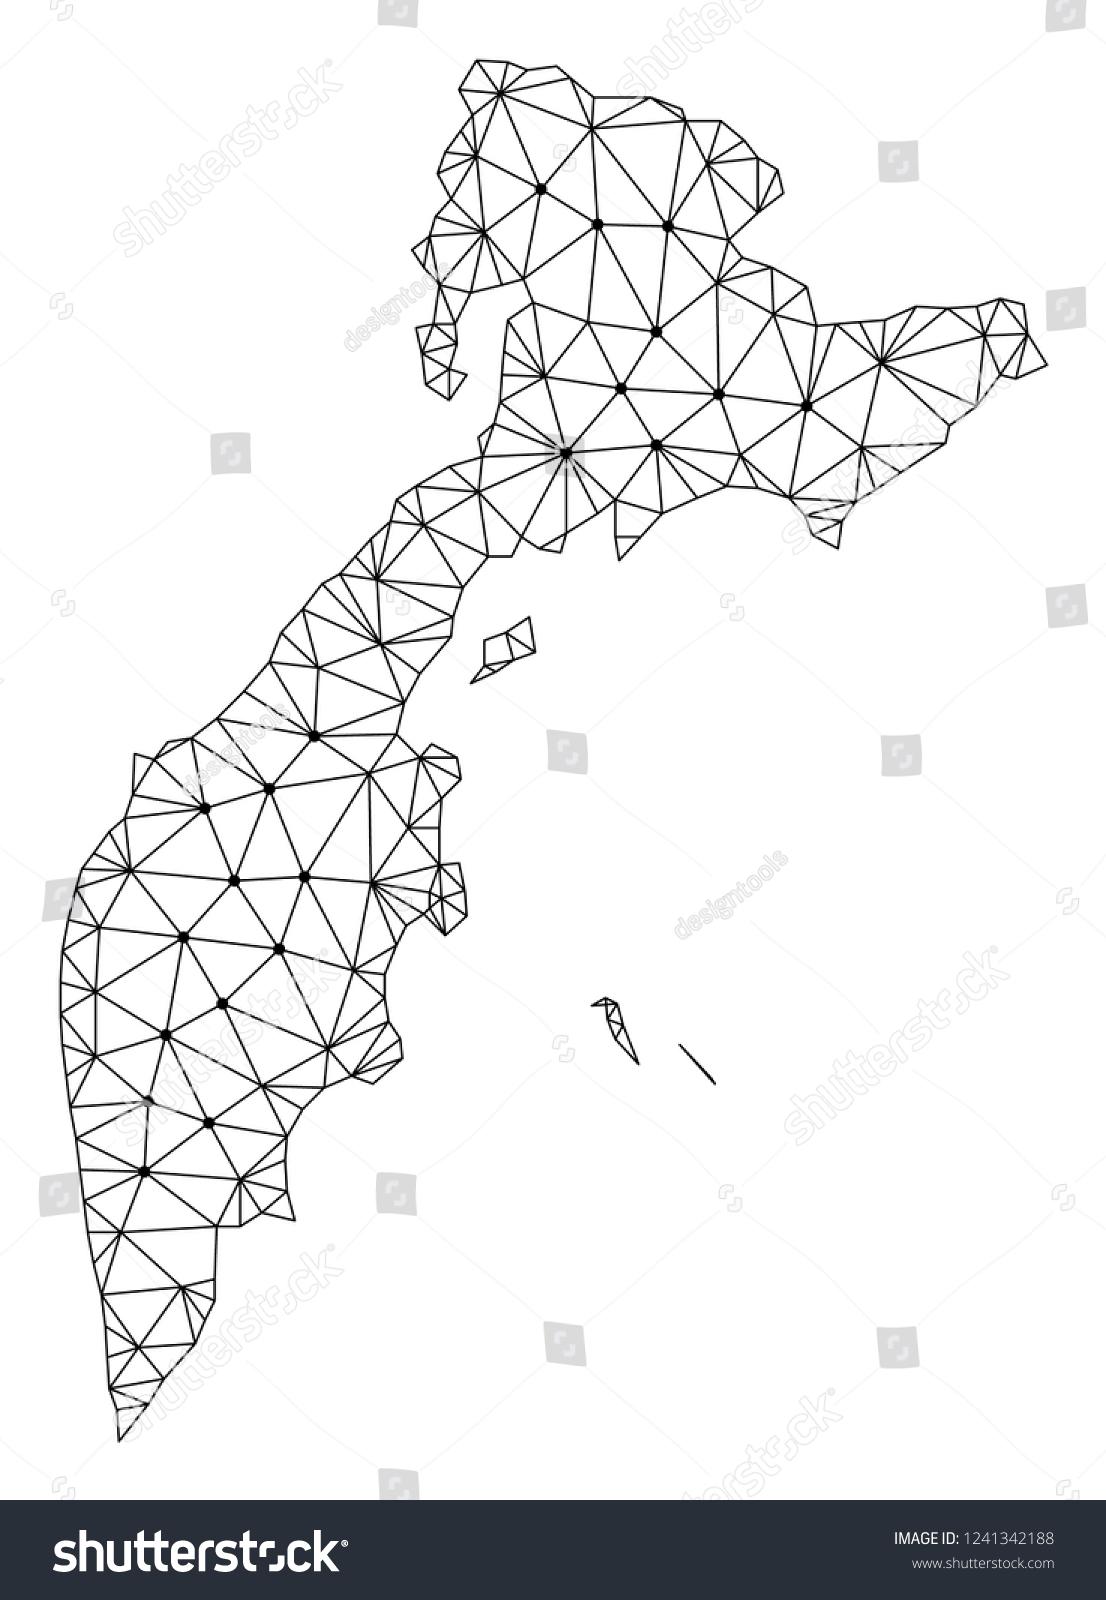 Polygonal Mesh Map Kamchatka Peninsula Black Stock Vector (Royalty on saint petersburg, volga river map, white sea map, siberia map, caucasus mountains map, don river, kola peninsula, sea of okhotsk, russia map, klyuchevskaya sopka, russian far east, irkutsk map, lake baikal, bering strait, aleutian islands, russian far east map, dnieper river map, west siberian plain, sea of okhotsk map, ob river map, kola peninsula map, sakhalin island map, kuril islands, kuril islands map, gobi desert map, bering strait map, ural mountains map, lake baikal map, amur river map,